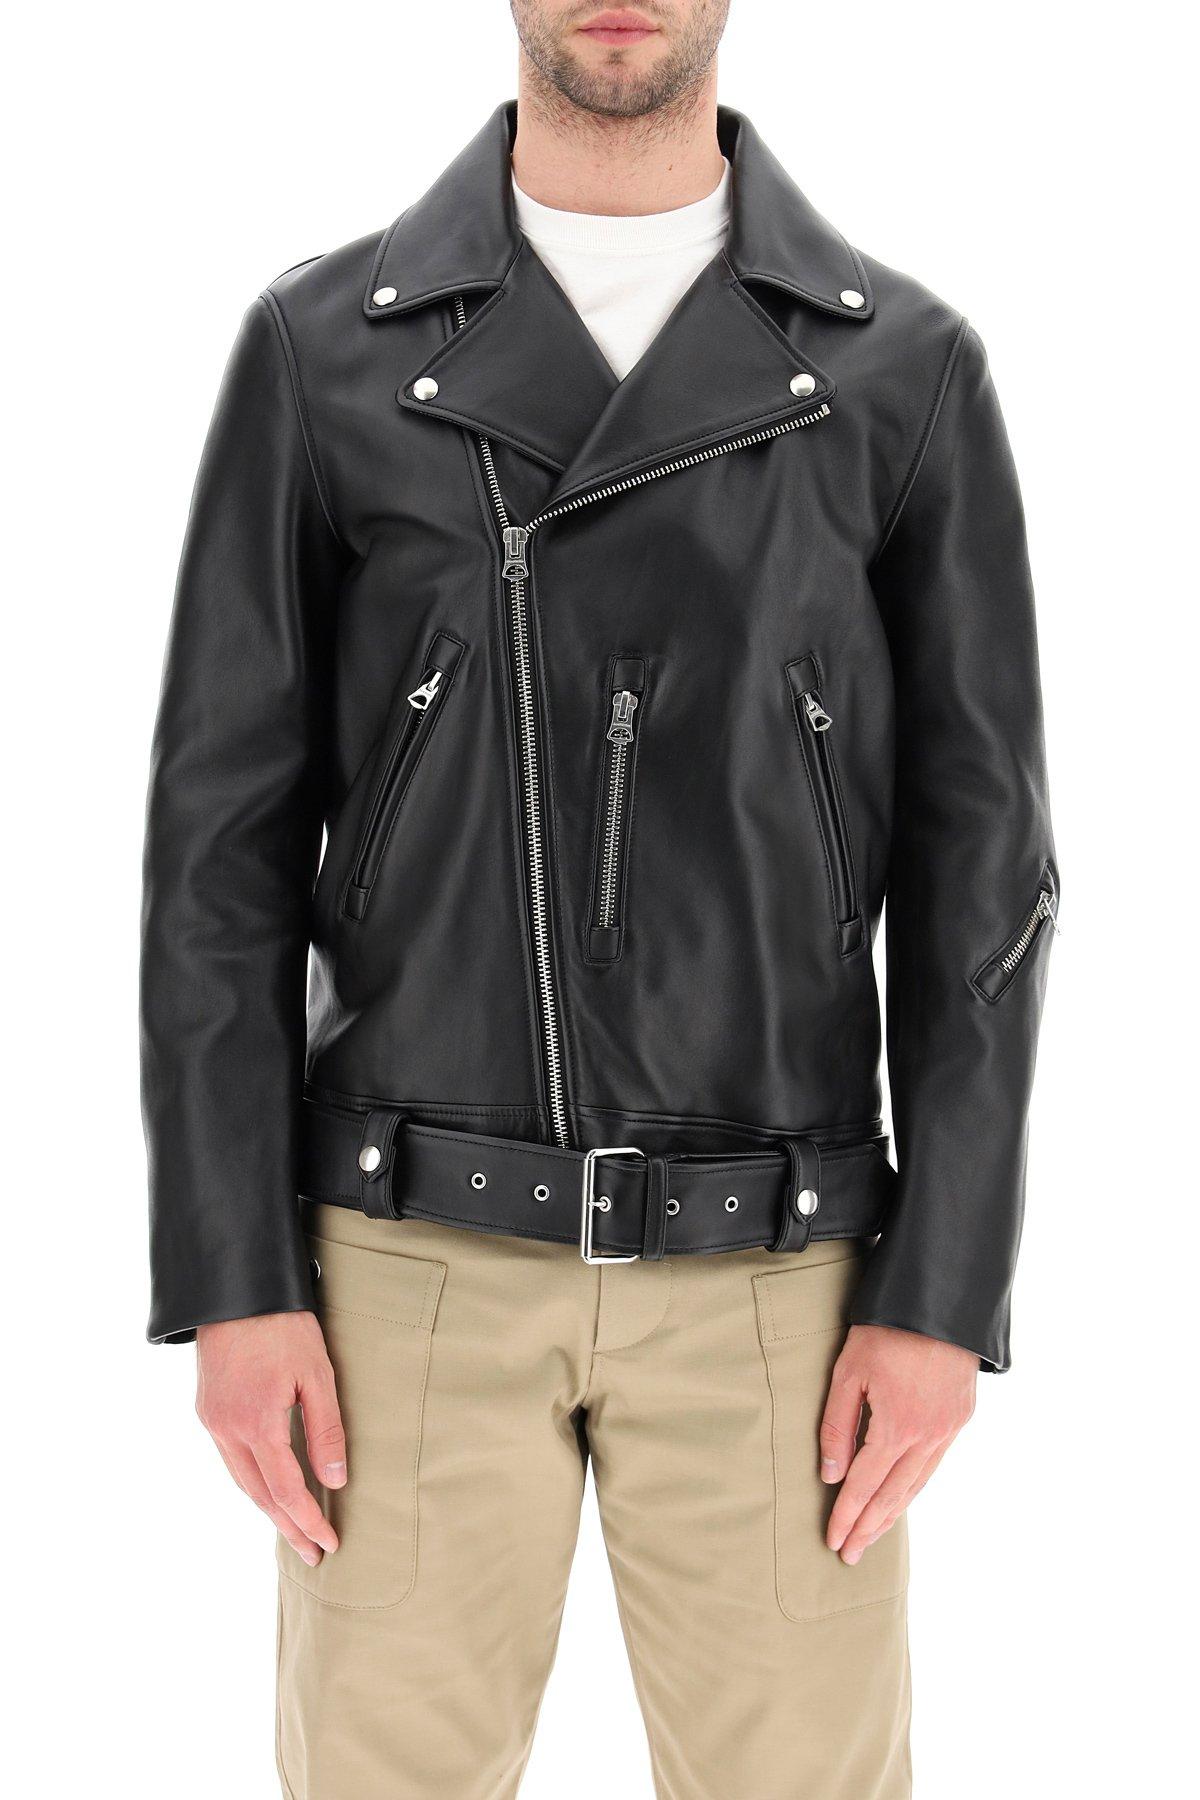 Acne studios giacca biker in pelle